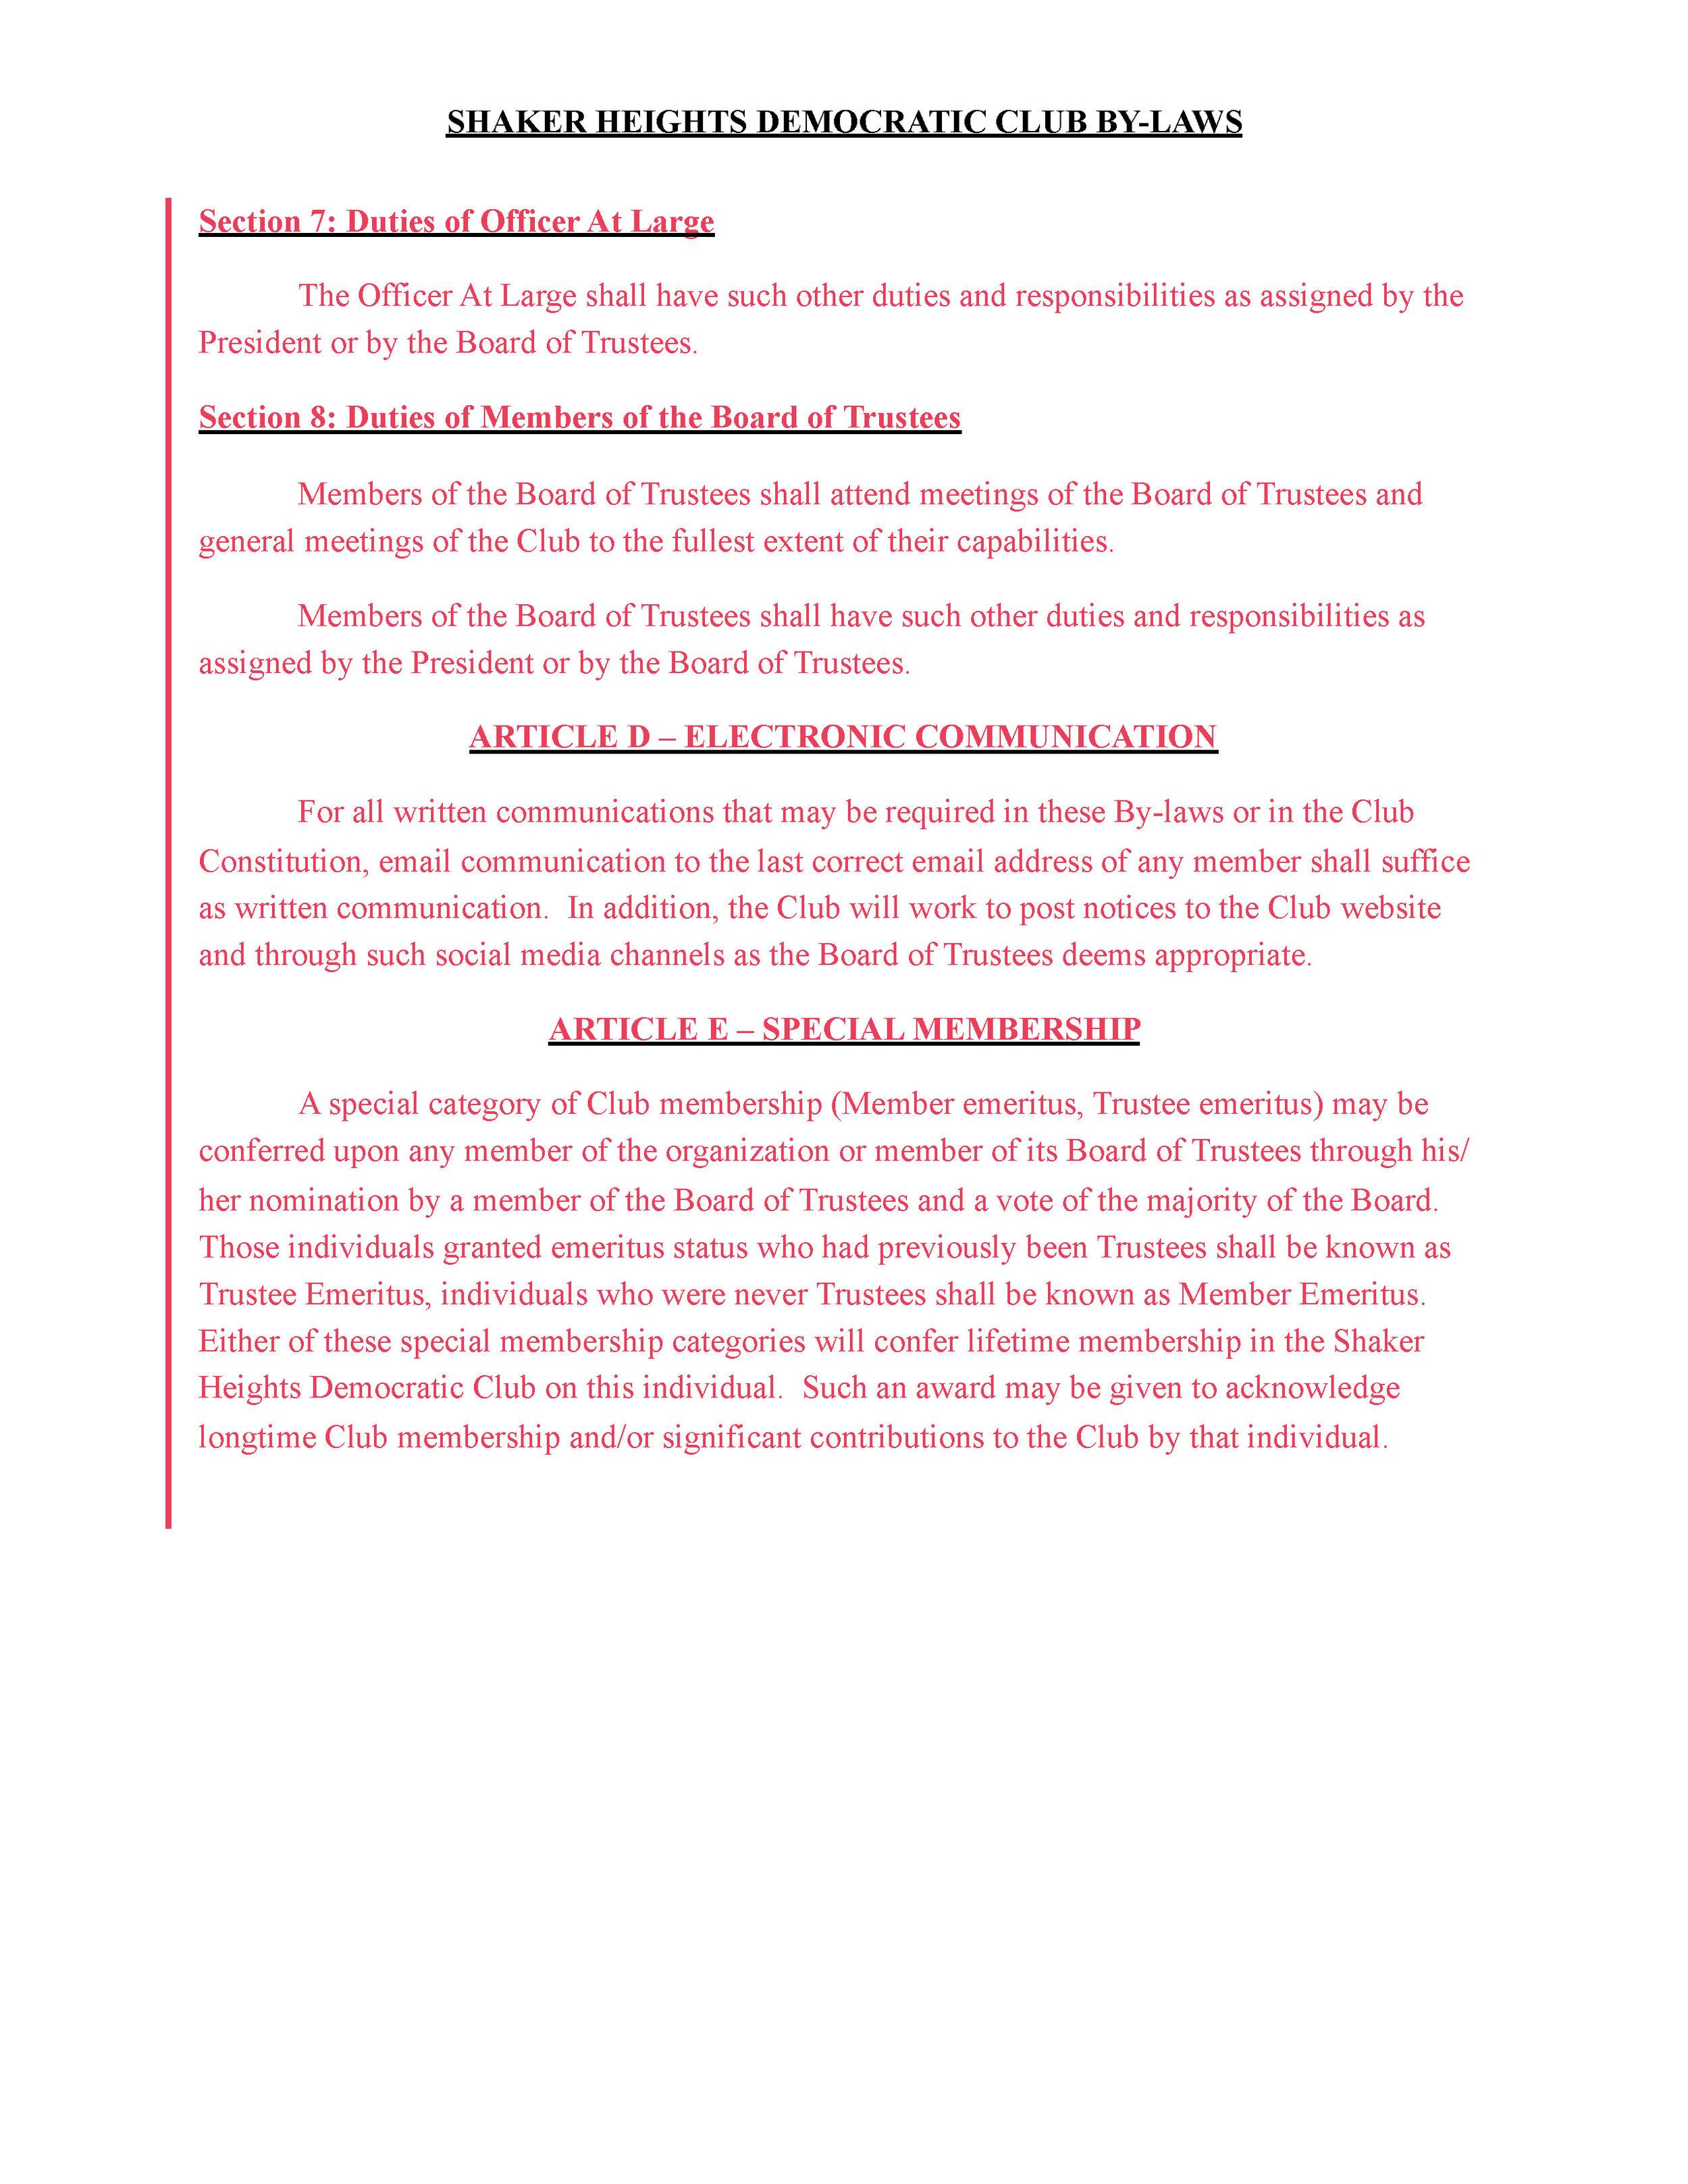 Shaker Dems Bylaws update Nov2018_Page_5.jpg